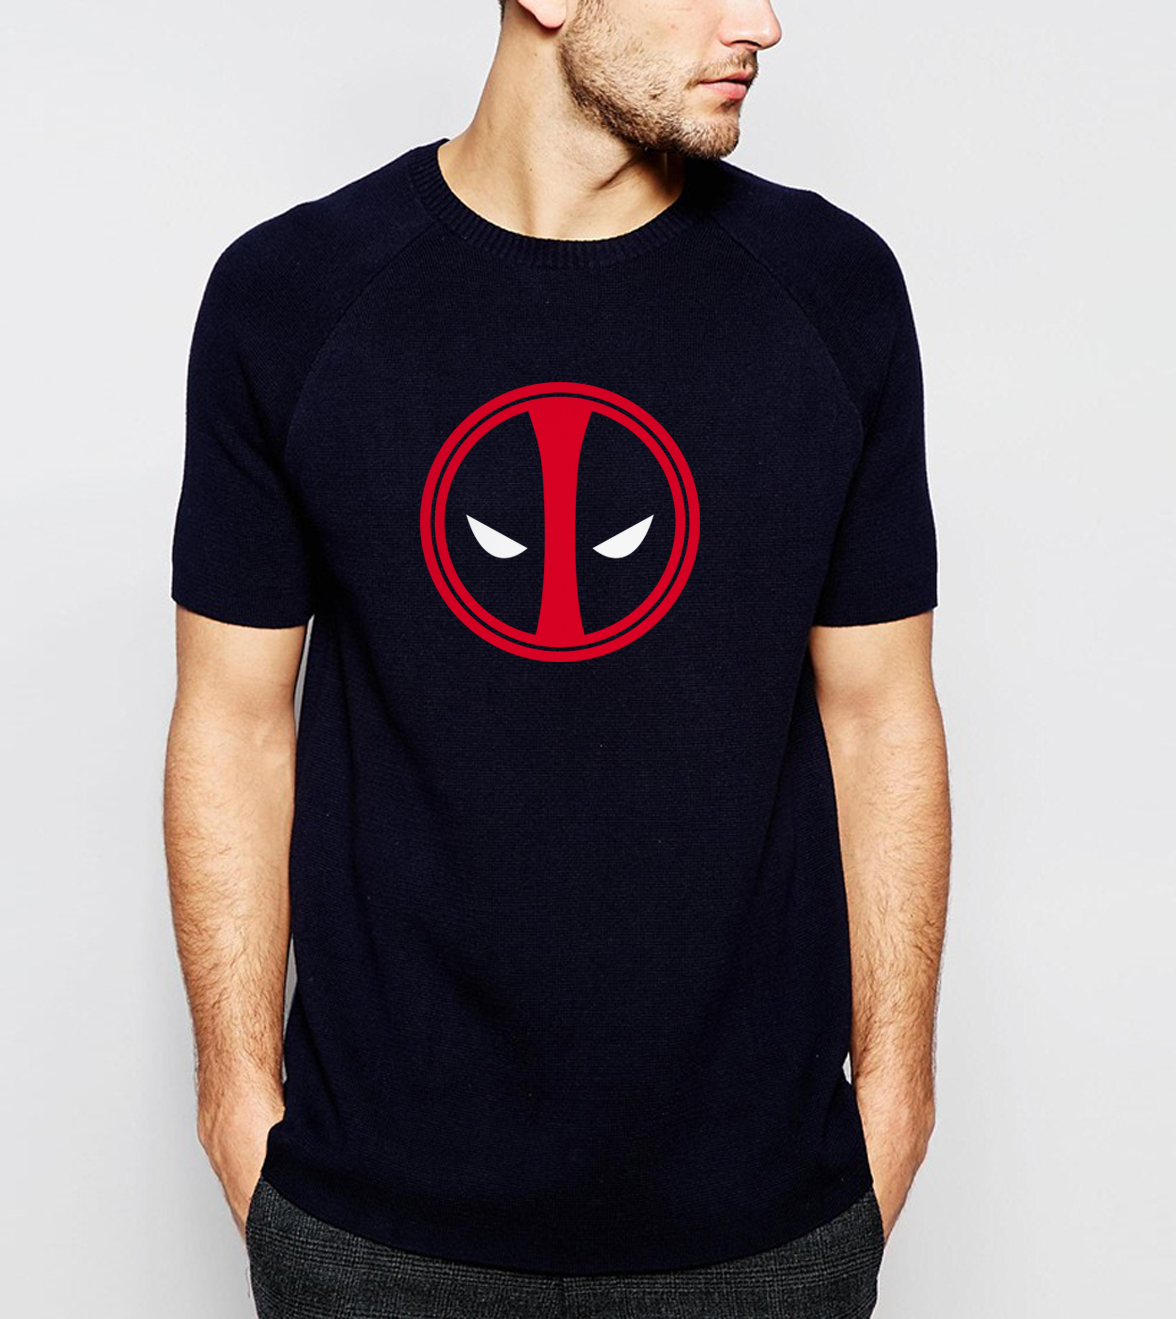 hot sale 2019 Summer X-men Deadpool   T  -  Shirt   100% Cotton Comfortable   T     Shirts   S-3XL Cartoon Top Tees For Fans Camiseta Masculino